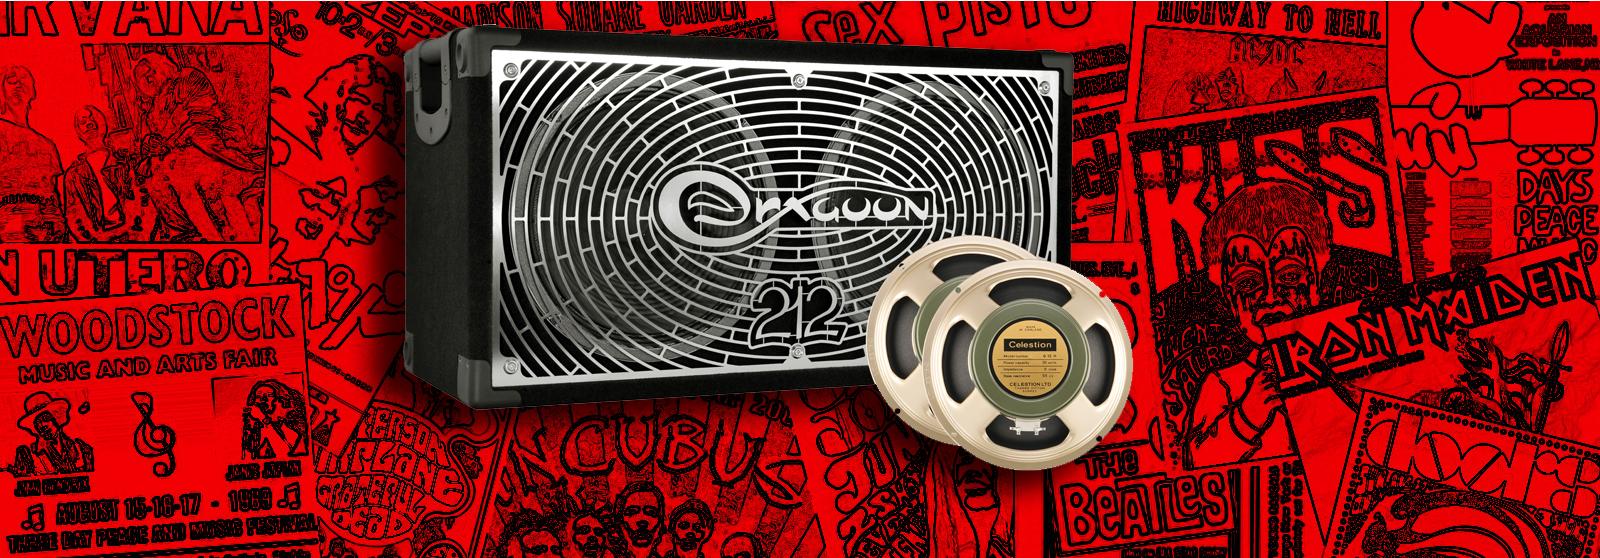 Dragoon - The Custom Speaker - DRAGOON-230C8HH-_20160629201249921987.jpg